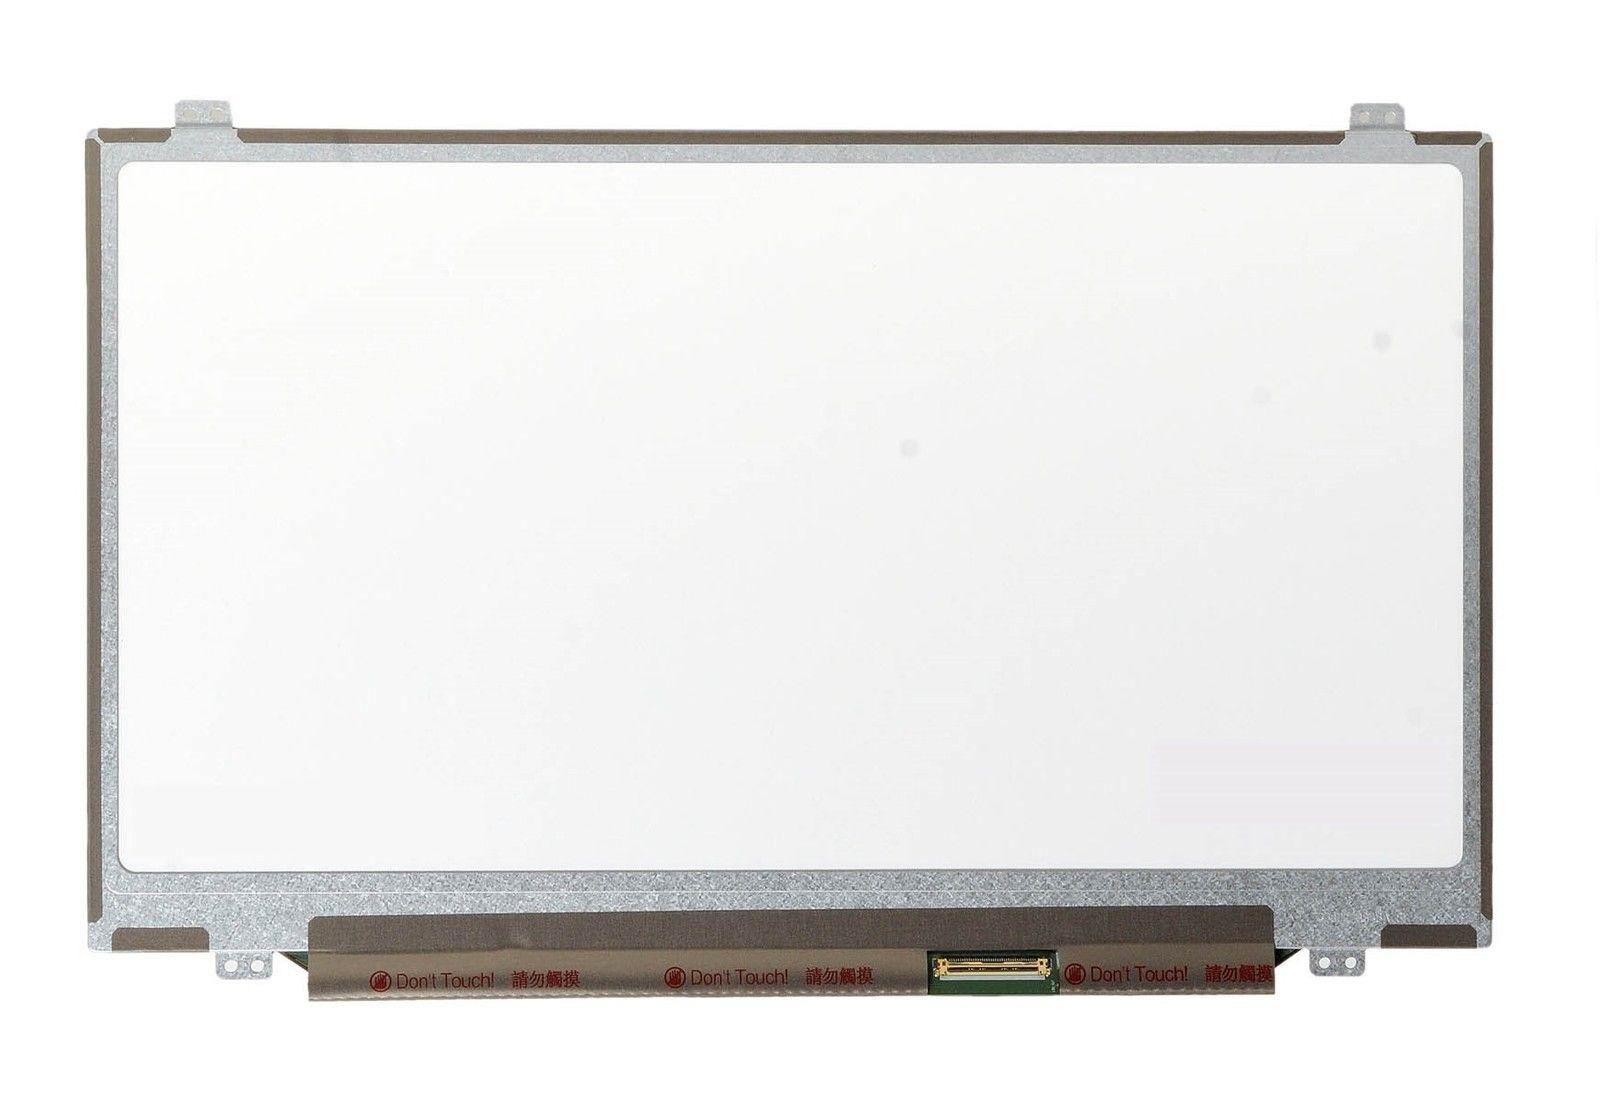 For HP ELITEBOOK FOLIO 14 SCREEN 9470M C6Z61UT New 14.0 HD Slim LED LCD Screen for hp elitebook folio 9470m led lcd laptop screen b140xtn02 5 1366x768 original new